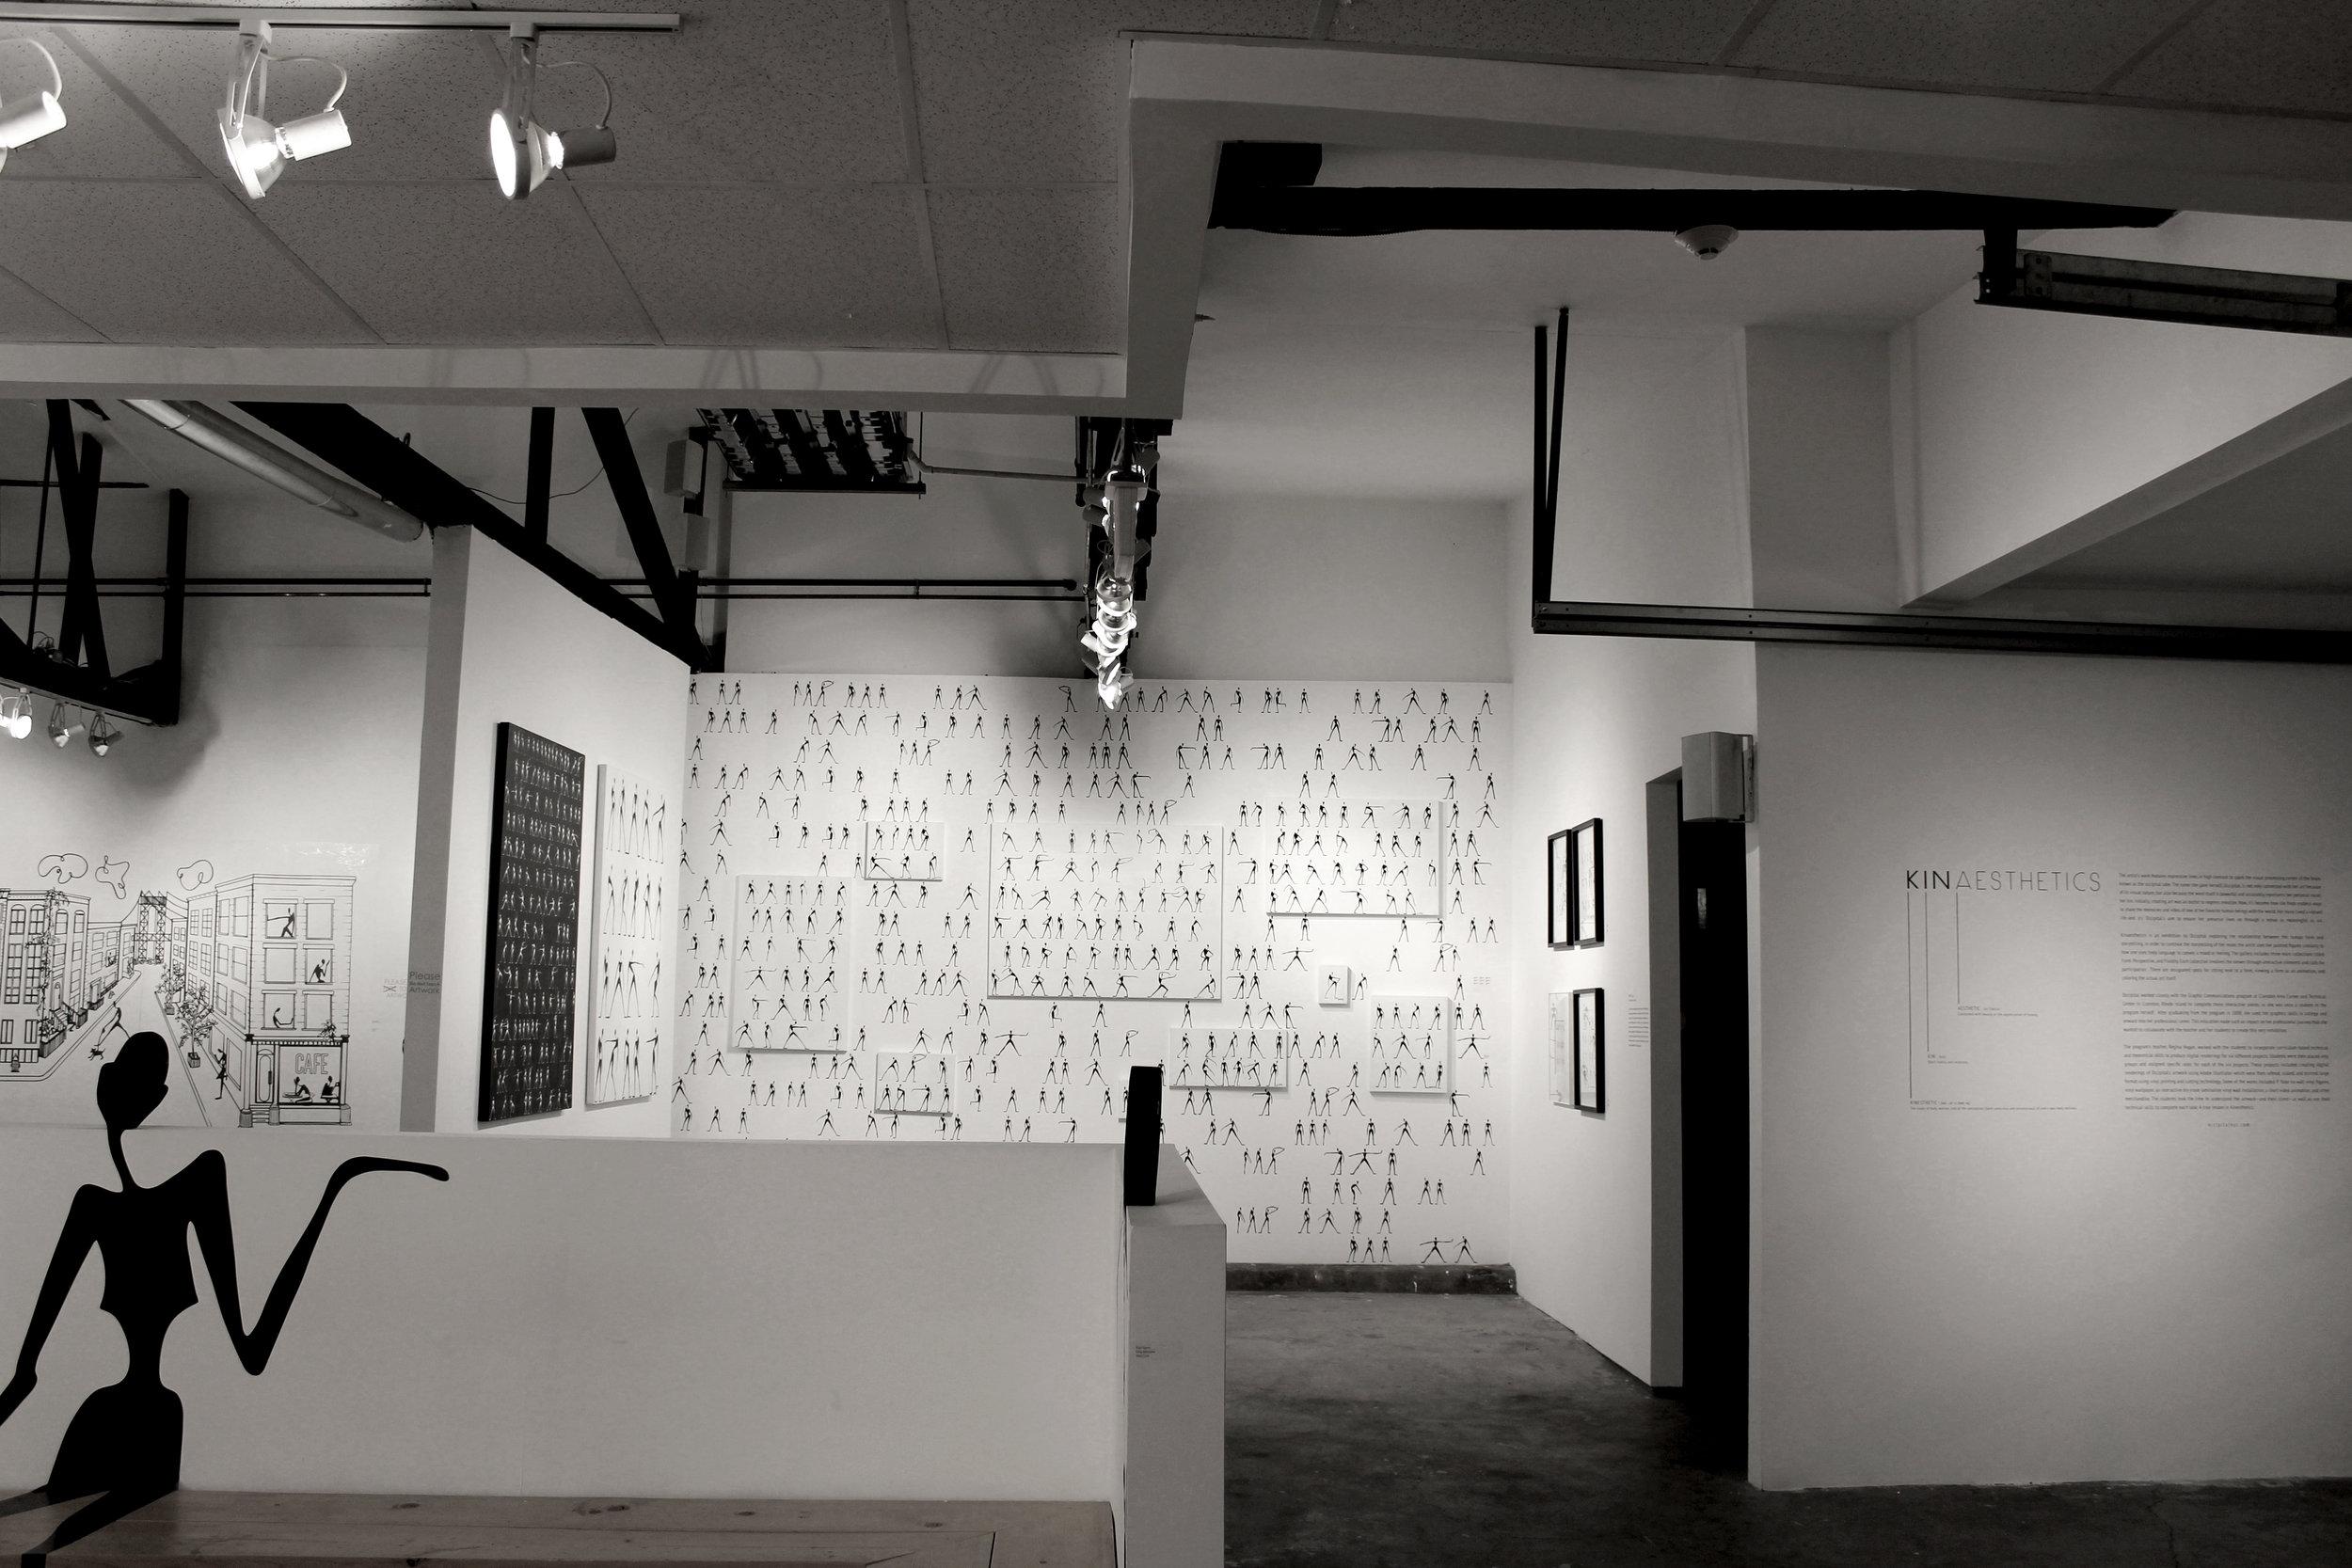 Kinaesthetics+gallery+2018.jpg